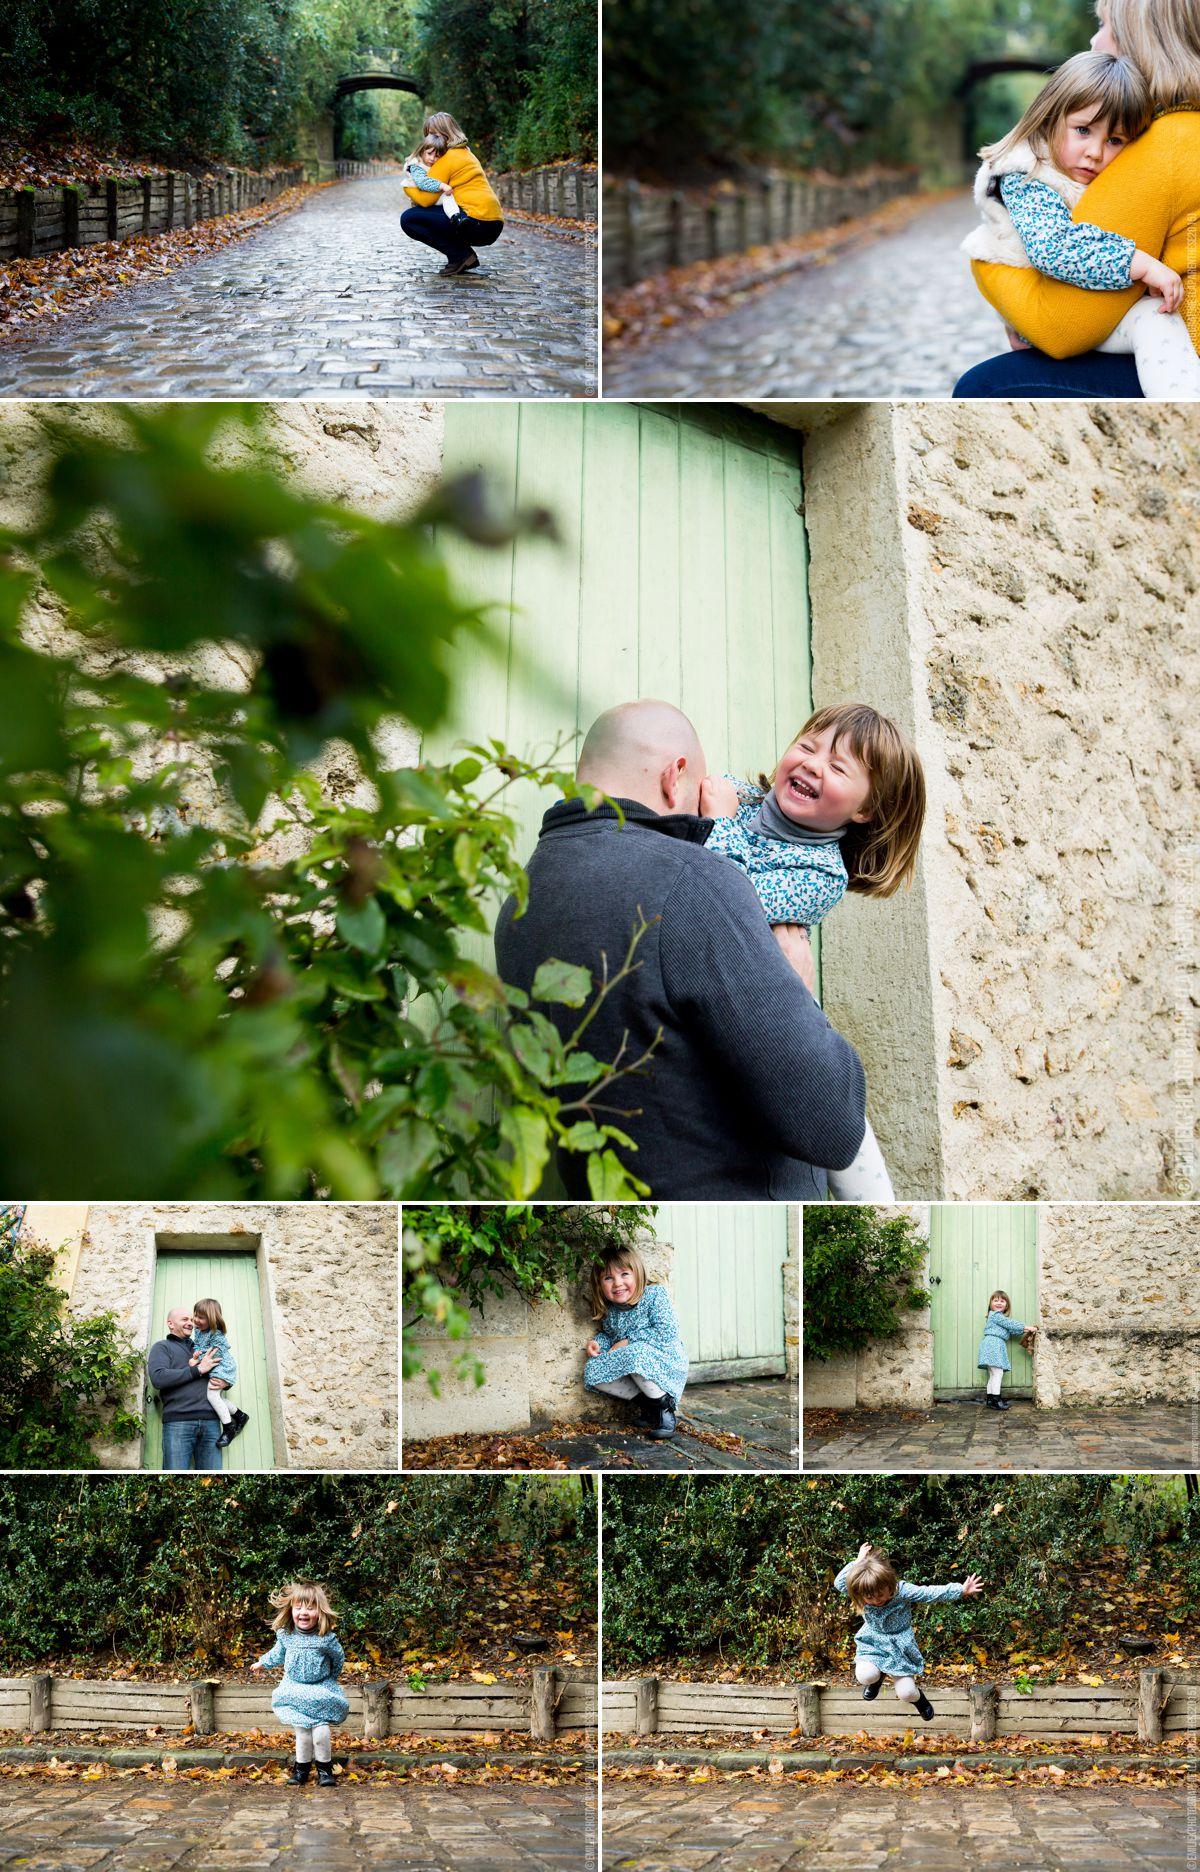 seancefamille-photographeemiliekphotographe-versailles 3